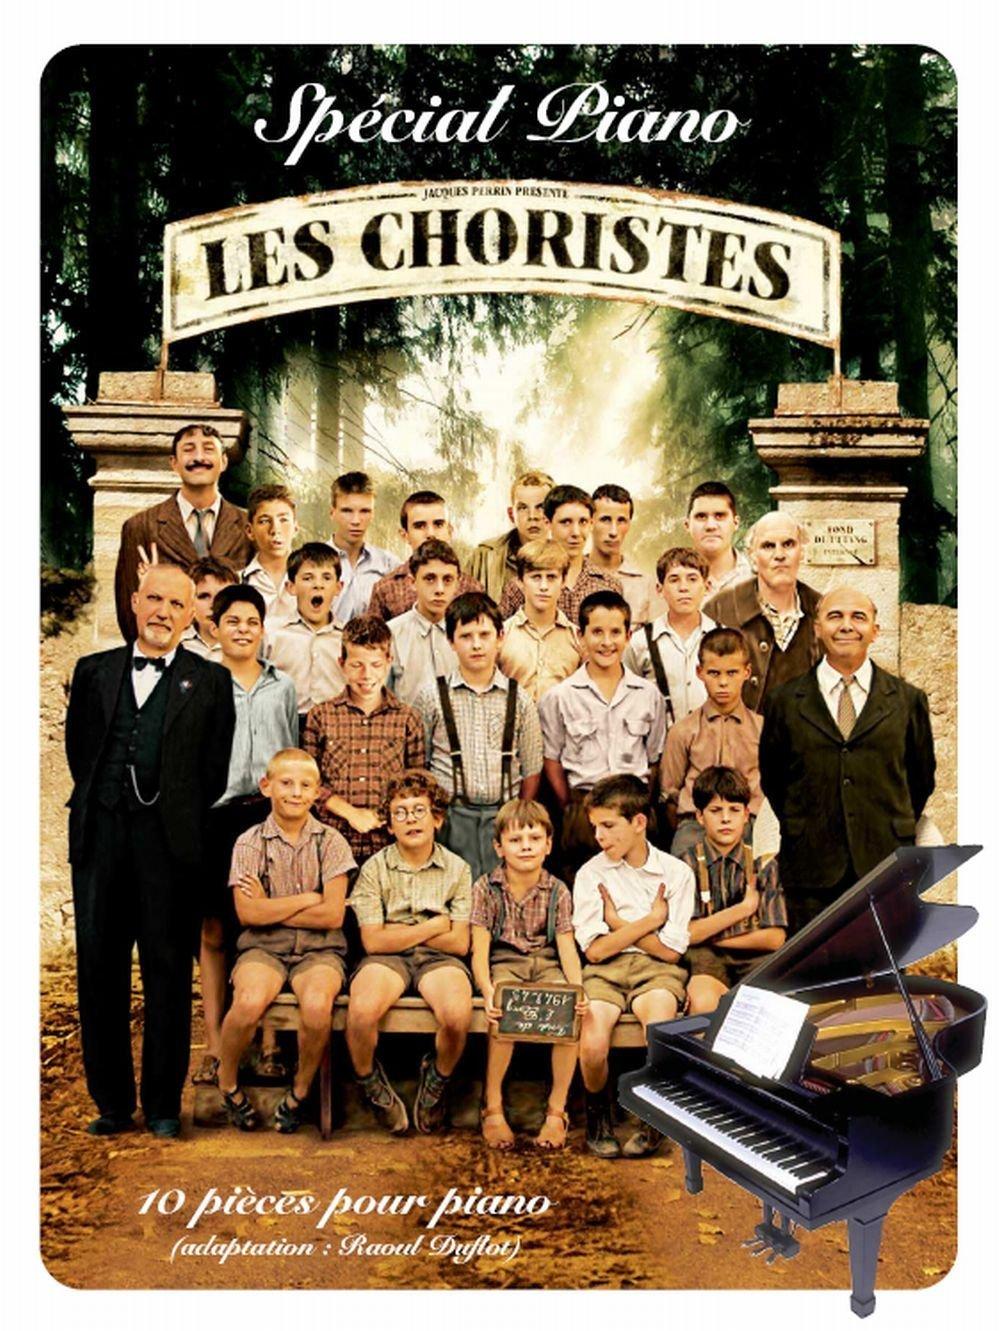 Les Choristes - Special Piano. Klavier